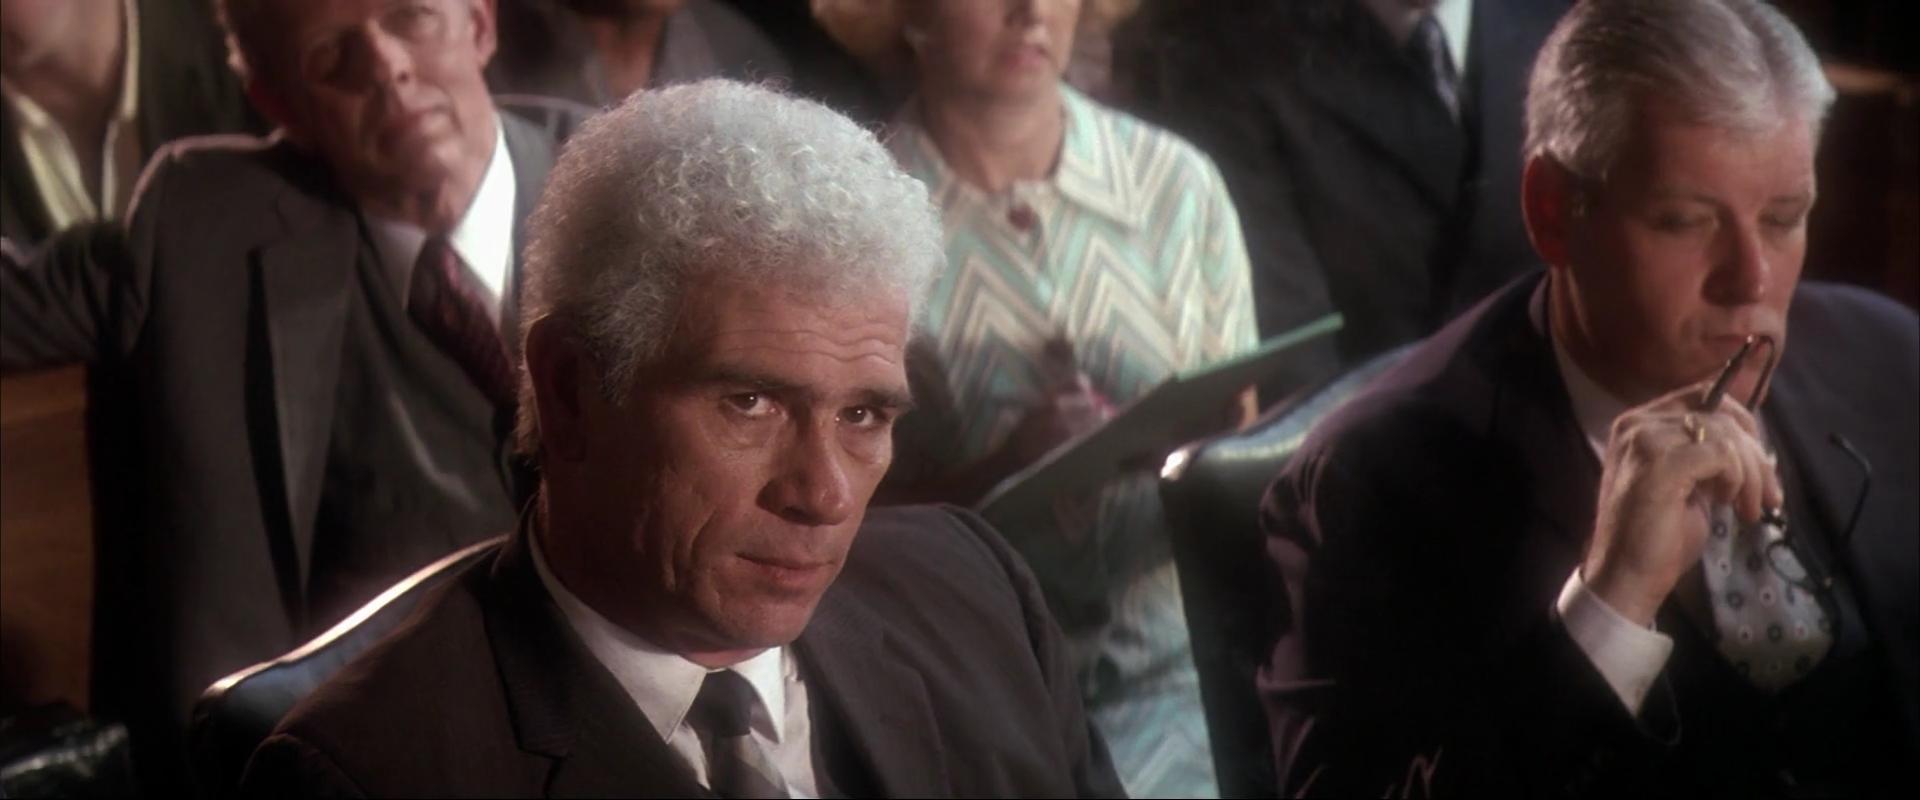 Tommy Lee Jones in JFK (1991)